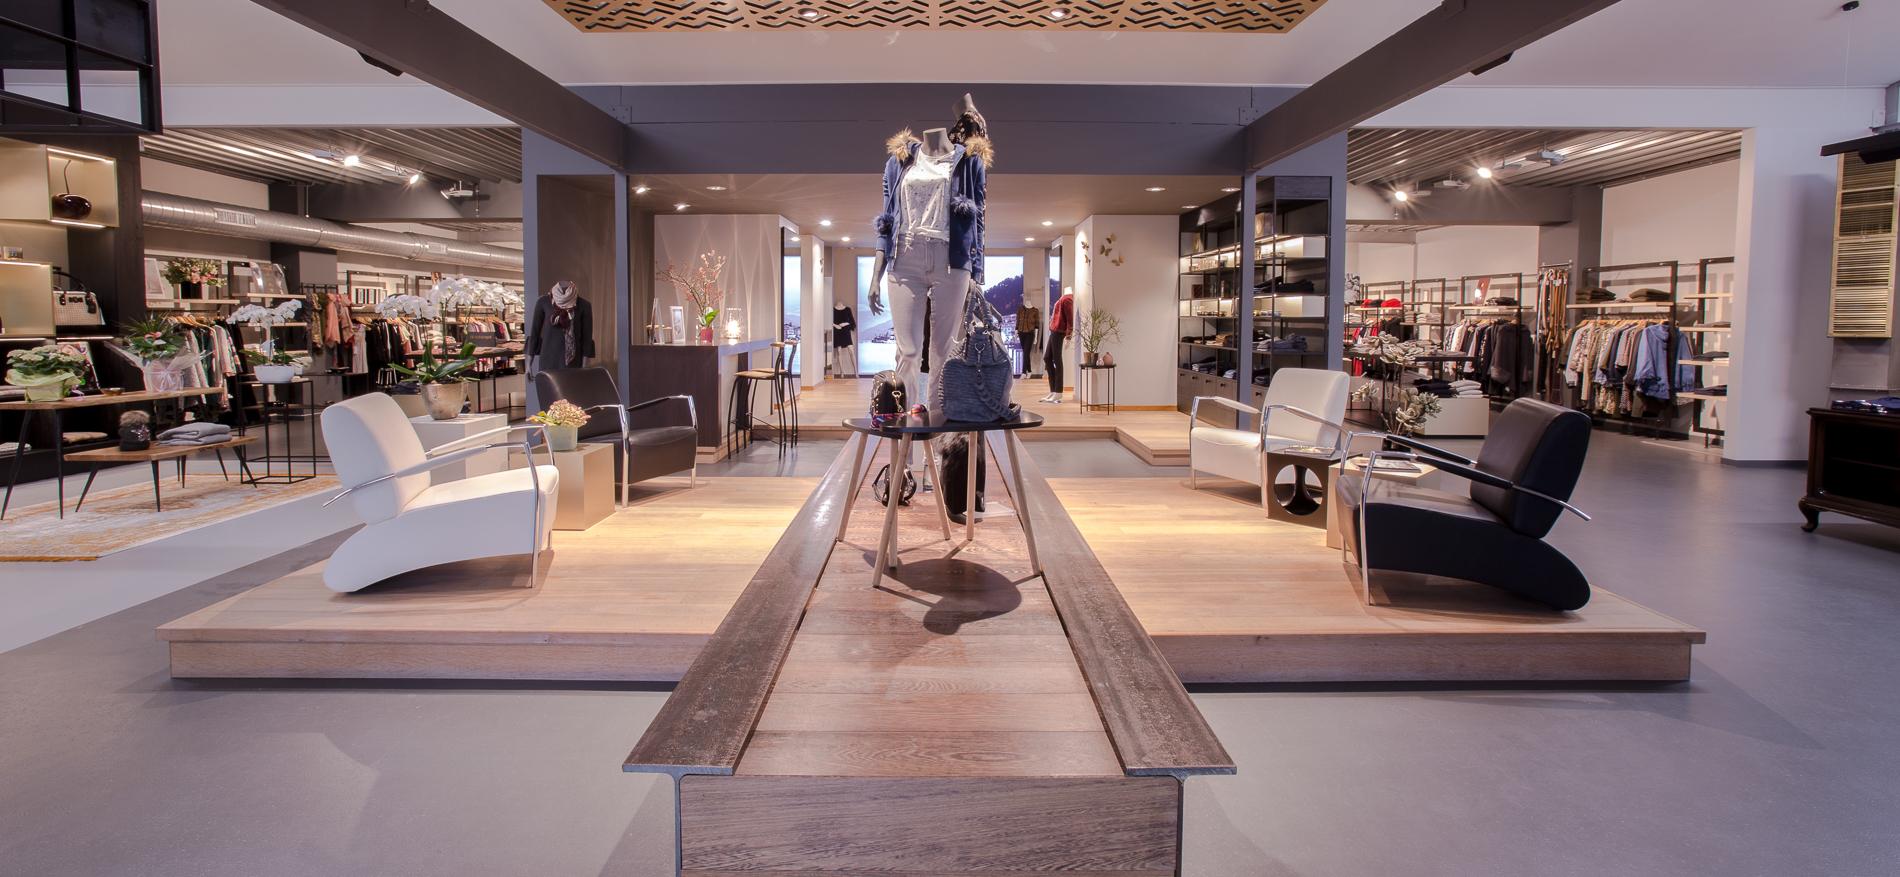 https://www.wsbladenbau.de/wp-content/uploads/2017/10/Como-Fashion-interieur-kledingwinkel-door-WSB-Winkelinrichting-rick-blankenstijn-rick-schreuder-QV1C5653.jpg